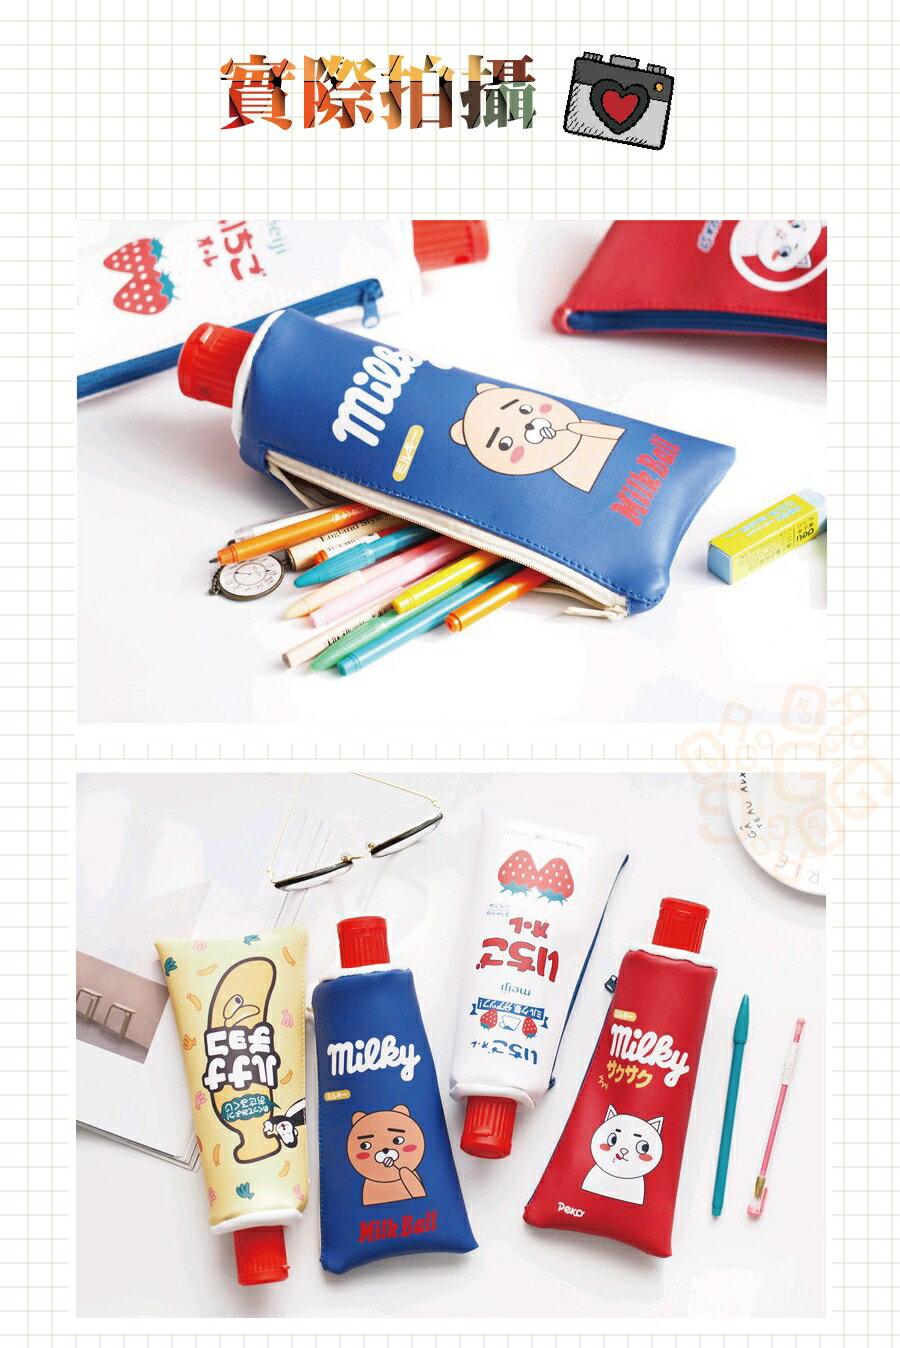 ORG《SG0227》限量款!附削鉛筆機 仿真 牙膏造型 鉛筆袋 收納袋 置物袋 鉛筆盒 筆袋 文具用品 交換禮物 創意 3